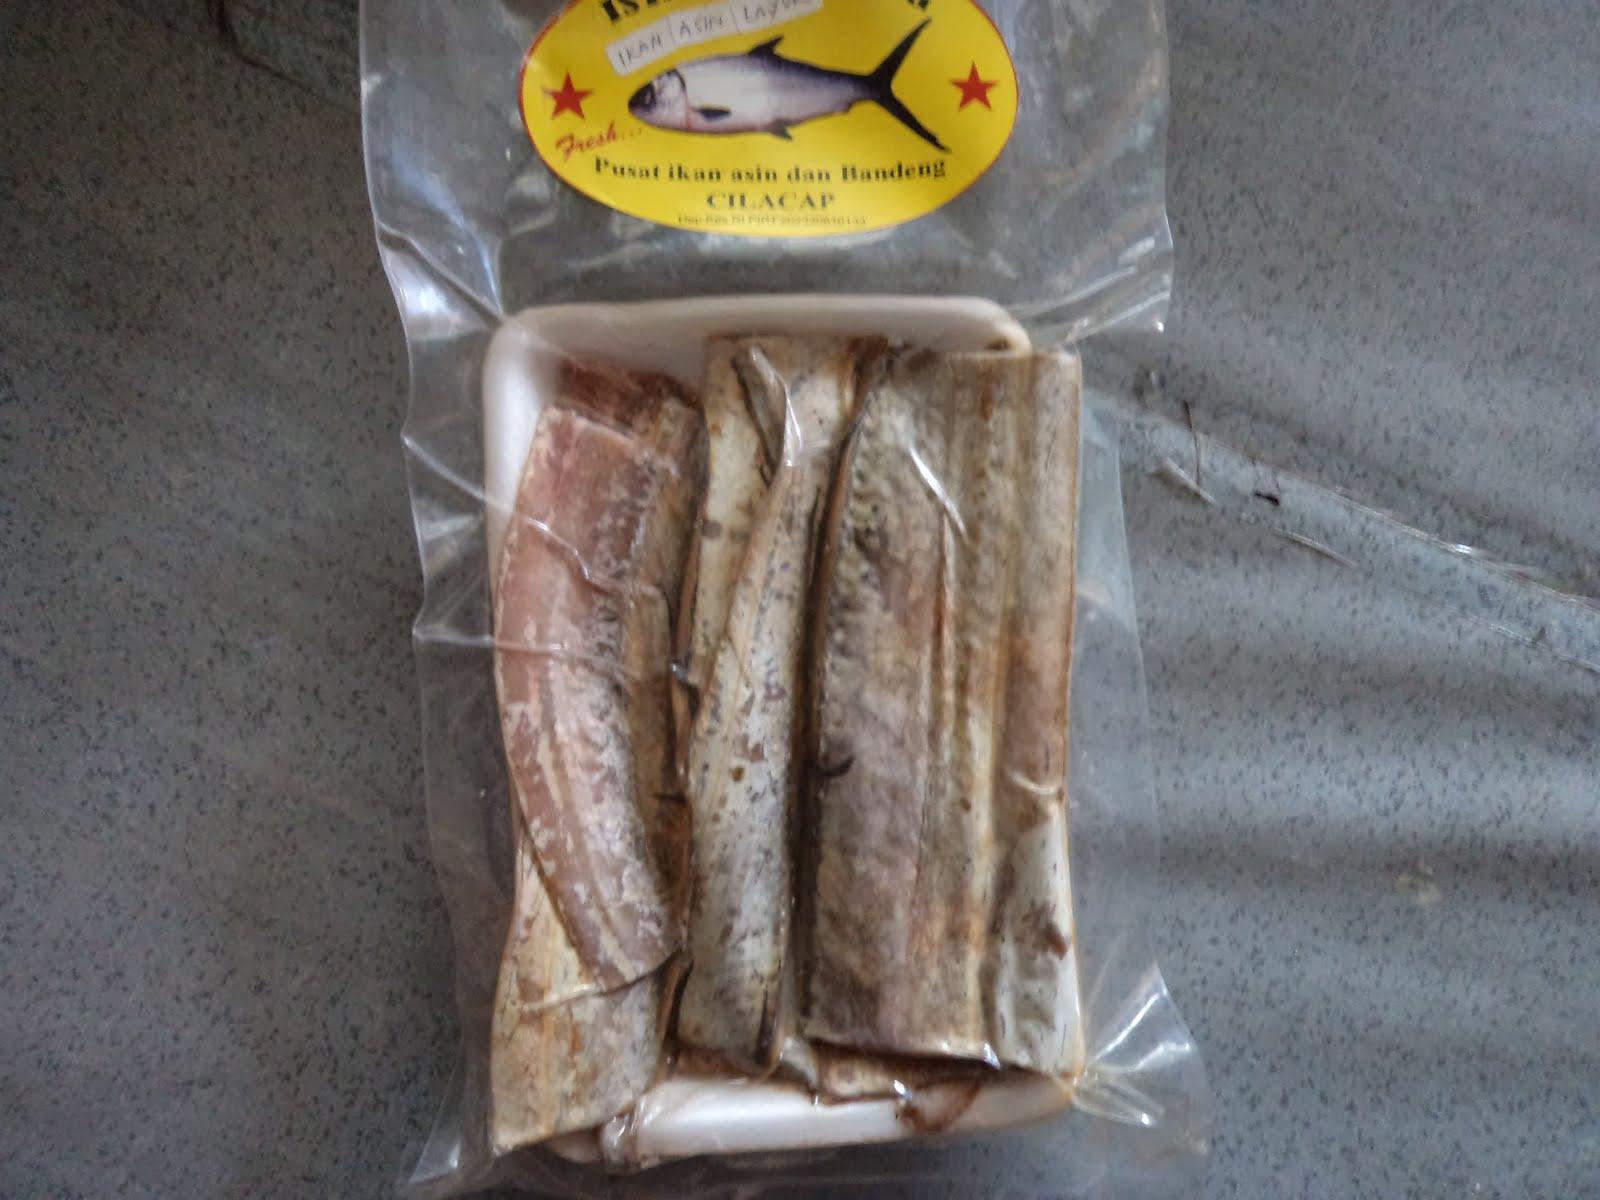 Pusat Ikan Asin Istana Bandeng Presto Cilacap